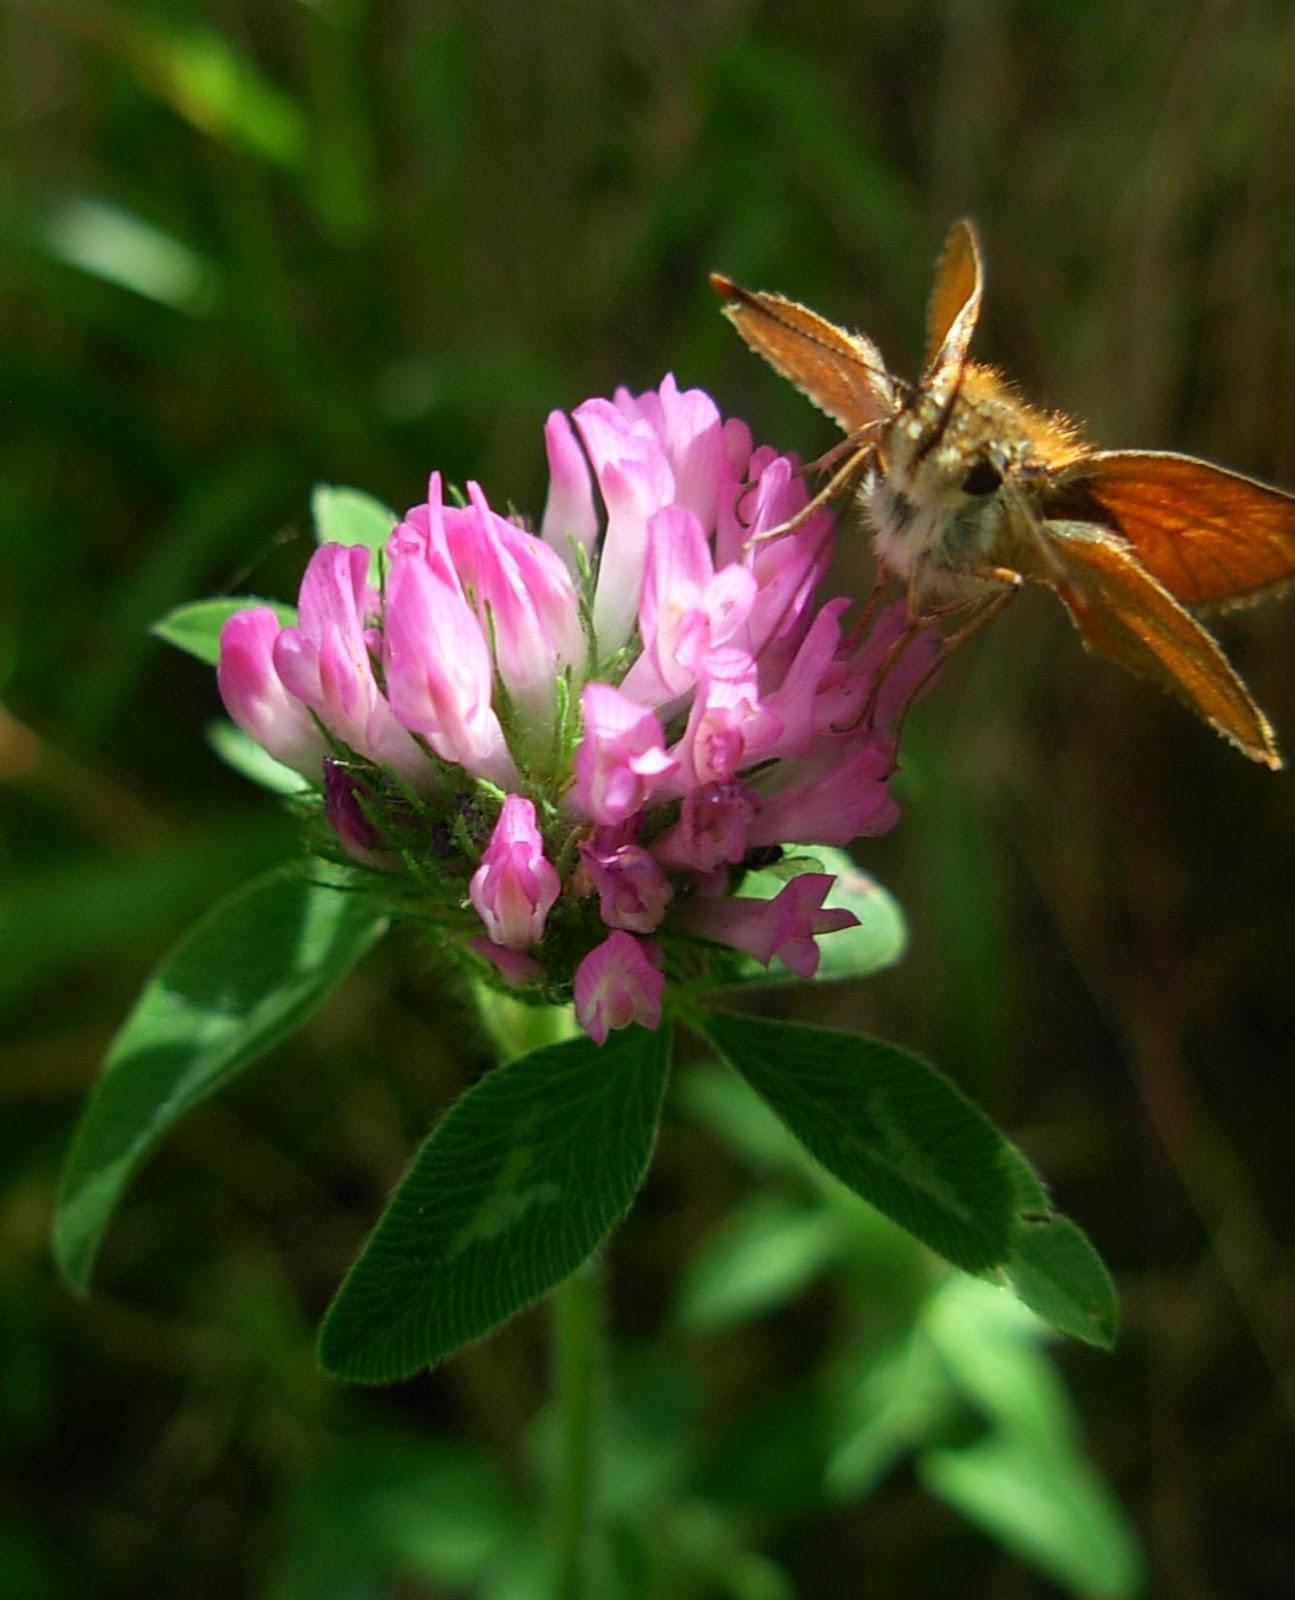 PlazaNavaluenga: Trébol rojo o violeta (Trifolium pratense)